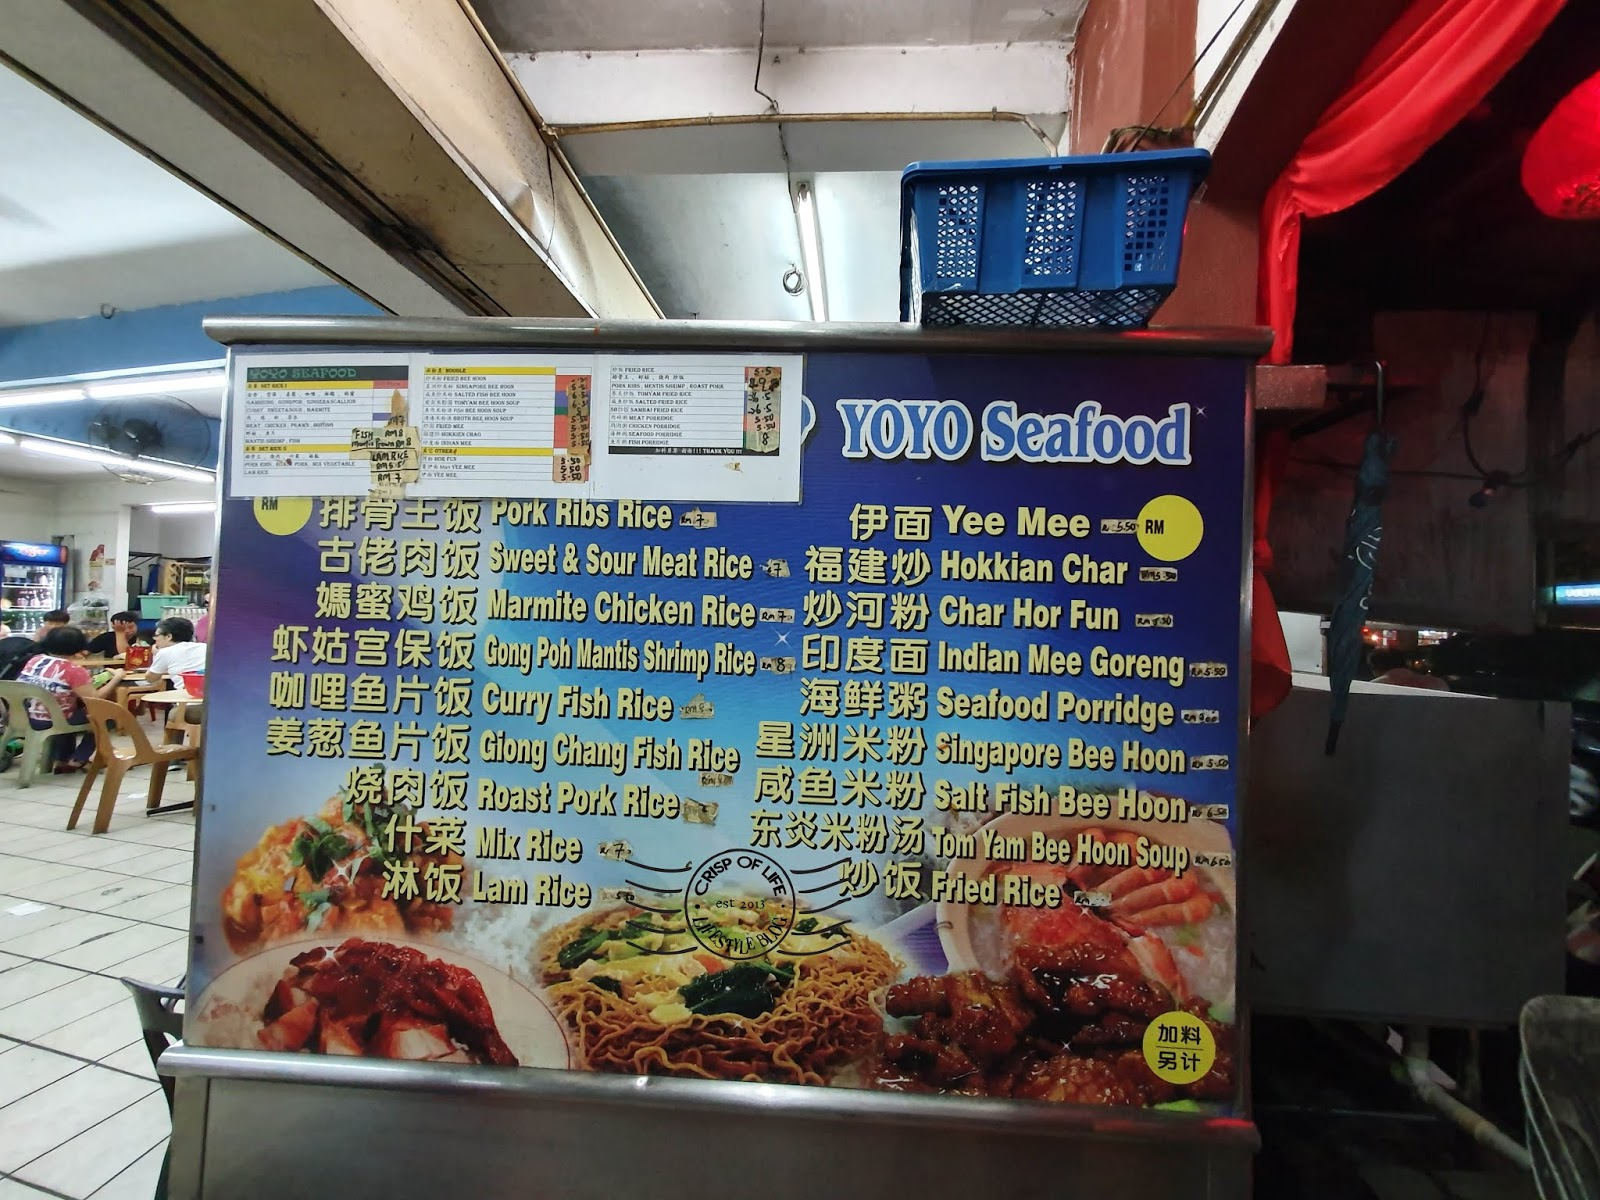 Yoyo Seafood Zhu Cha  Yoyo Huat Kafe, Sungai Ara, Bayan Lepas, Penang